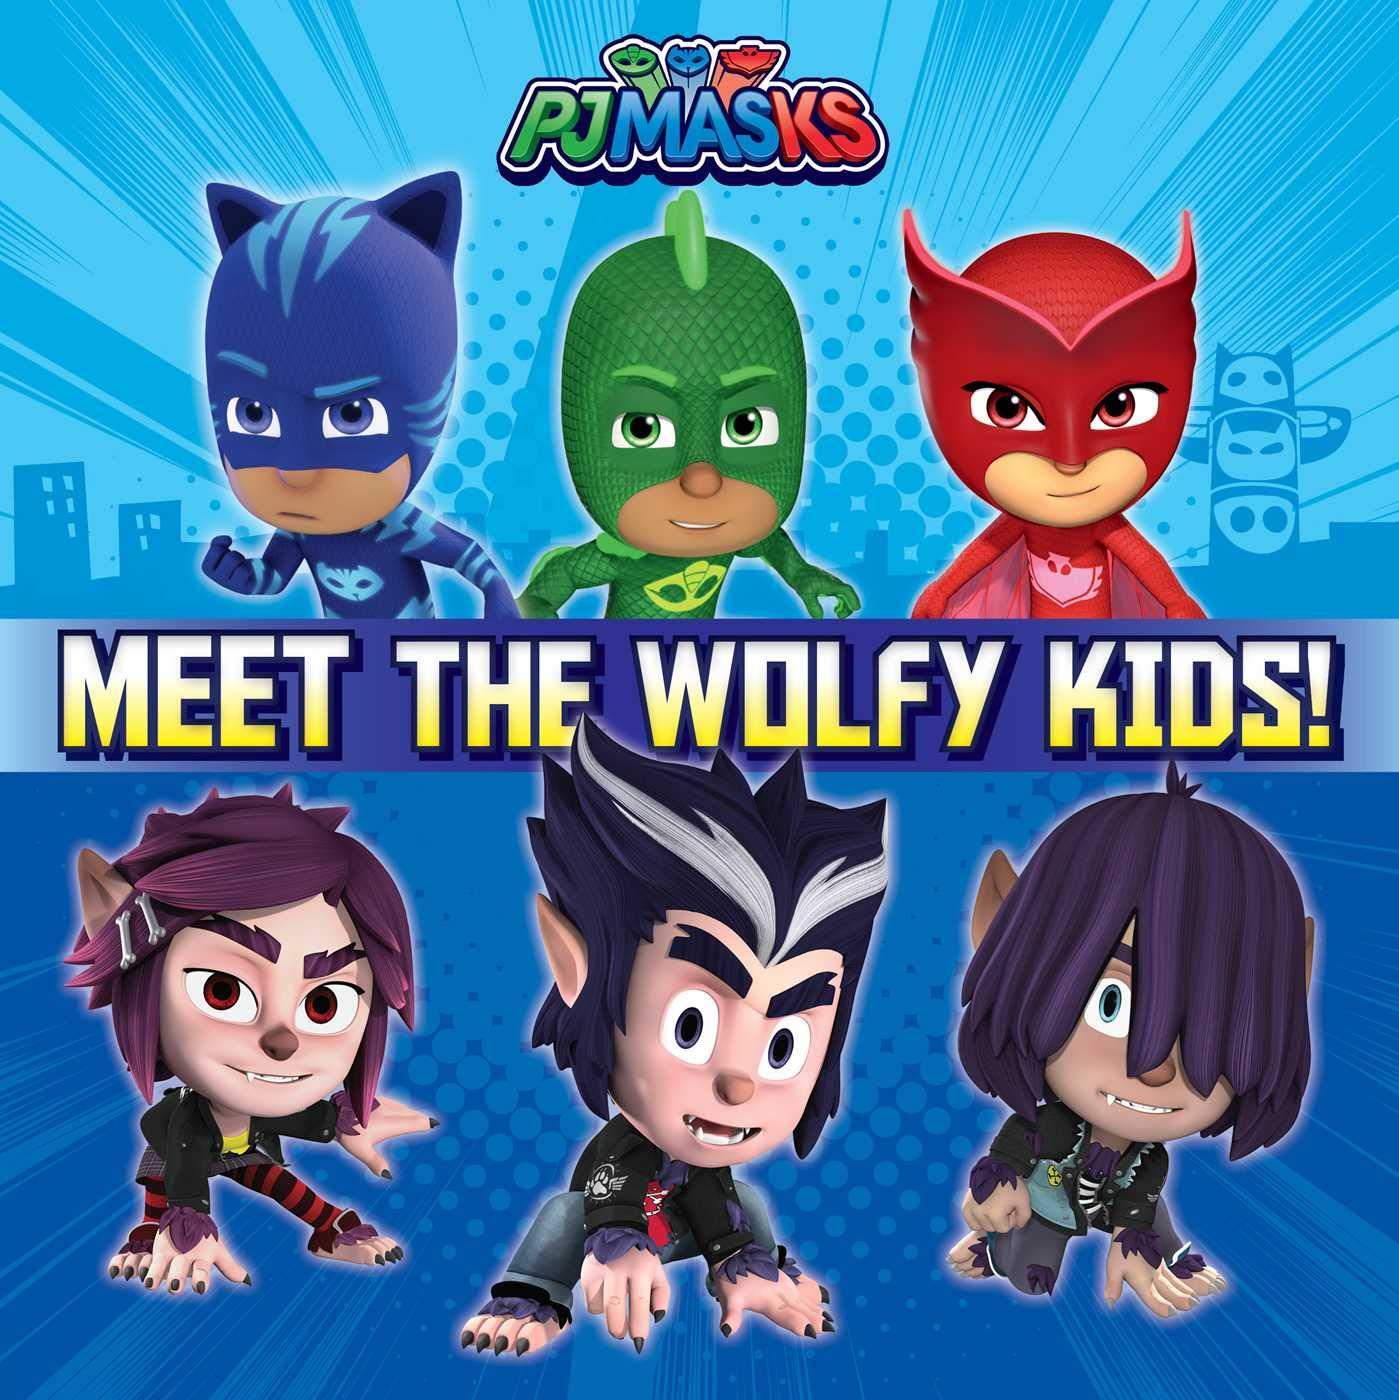 Meet the Wolfy Kids! (Pj Masks) : Michaels, Patty: Amazon.es ...